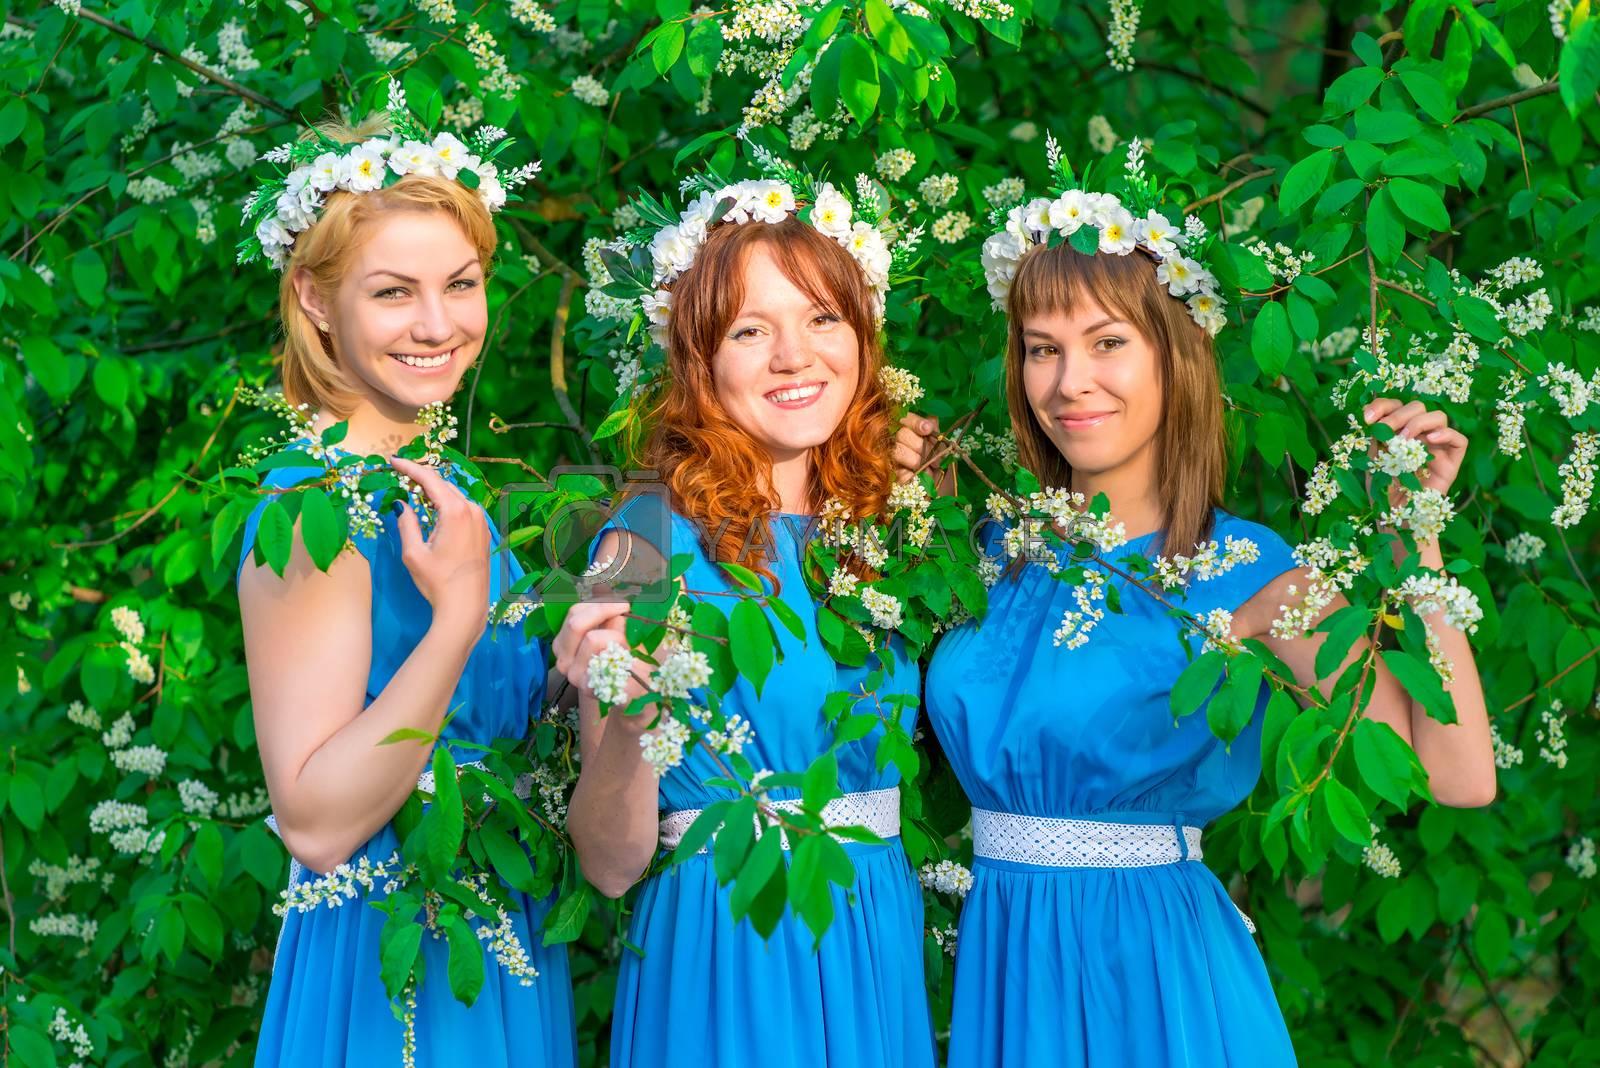 Three happy girls in identical dresses posing in the garden in spring